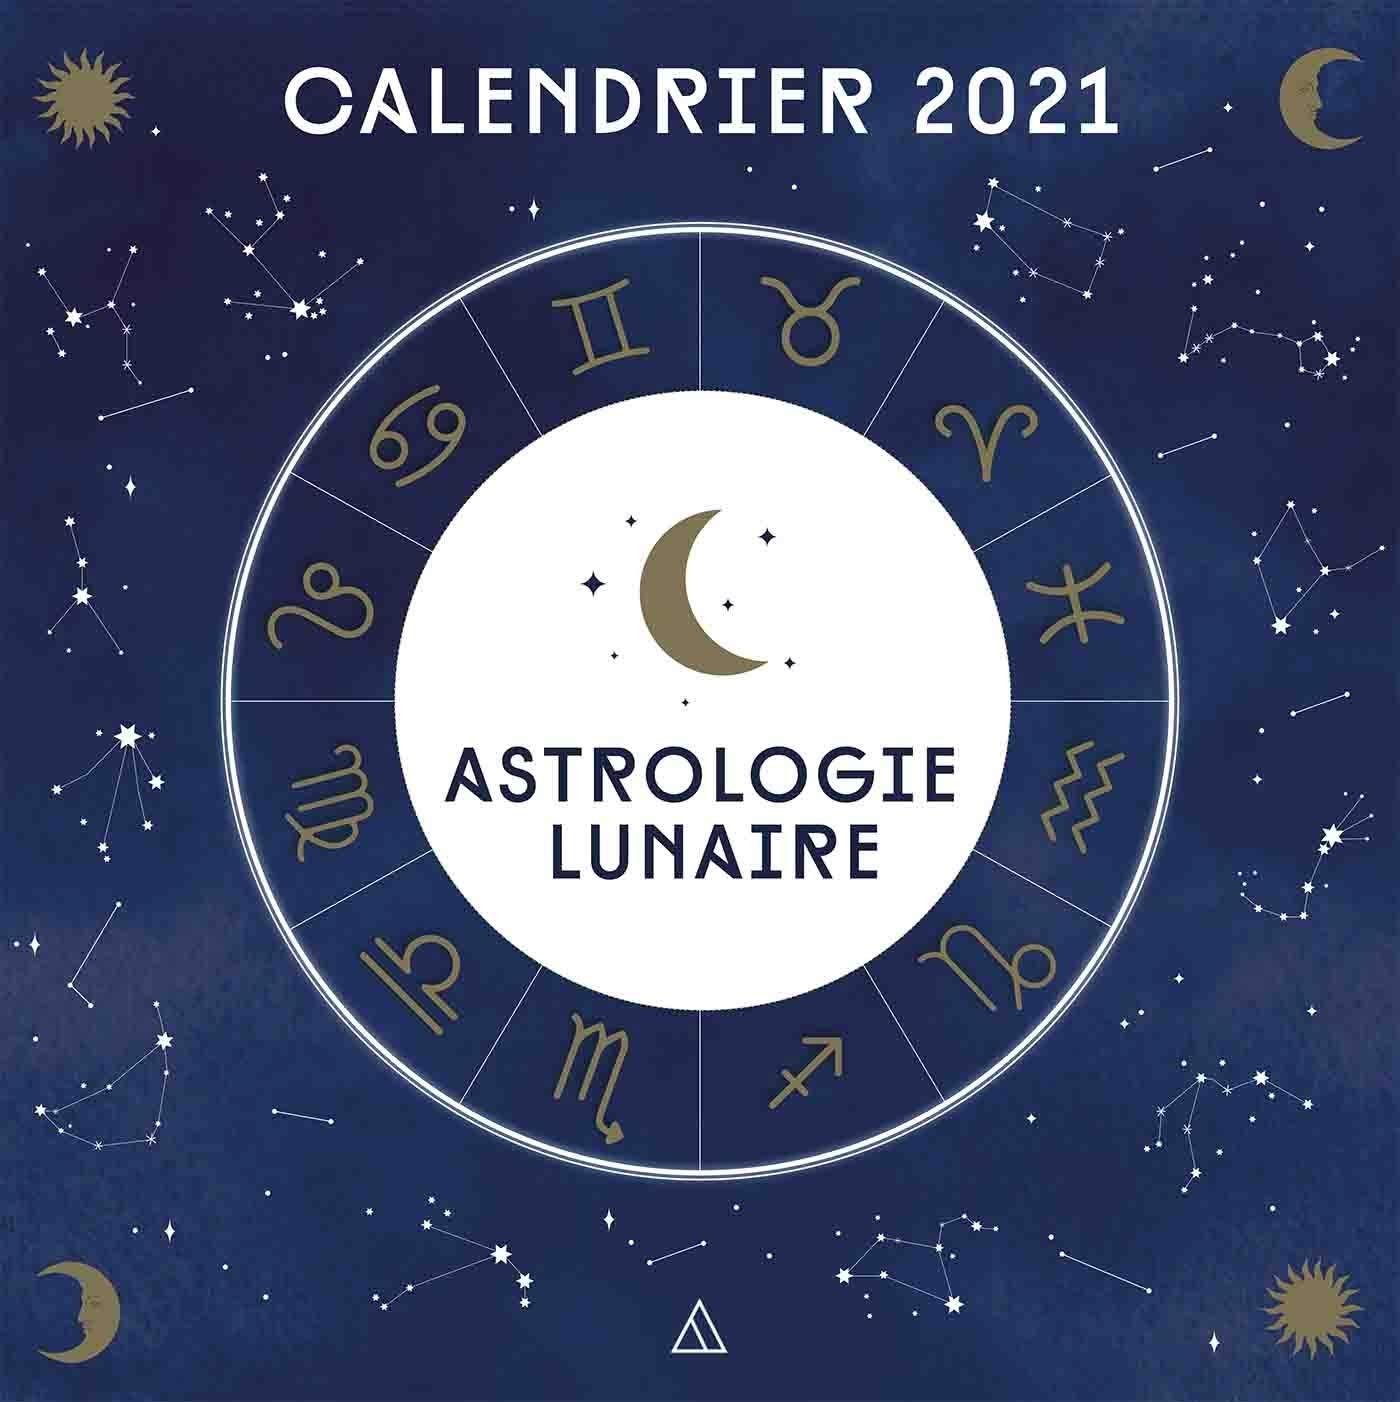 Calendrier mural 2021  Astrologie lunaire: 9782379642050: Amazon